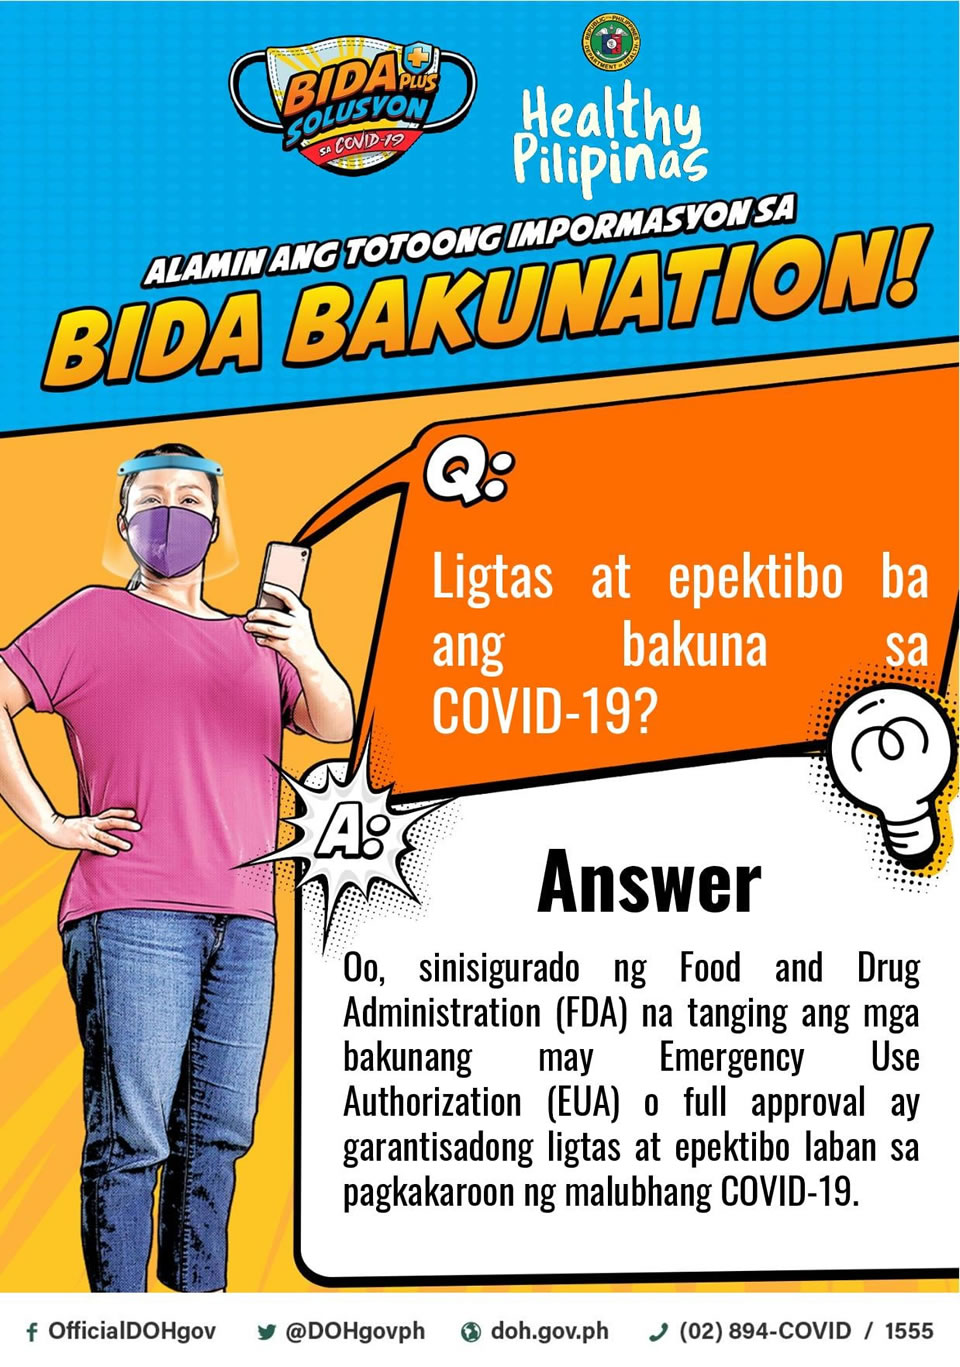 bida-bakunation-13-1-4-2021